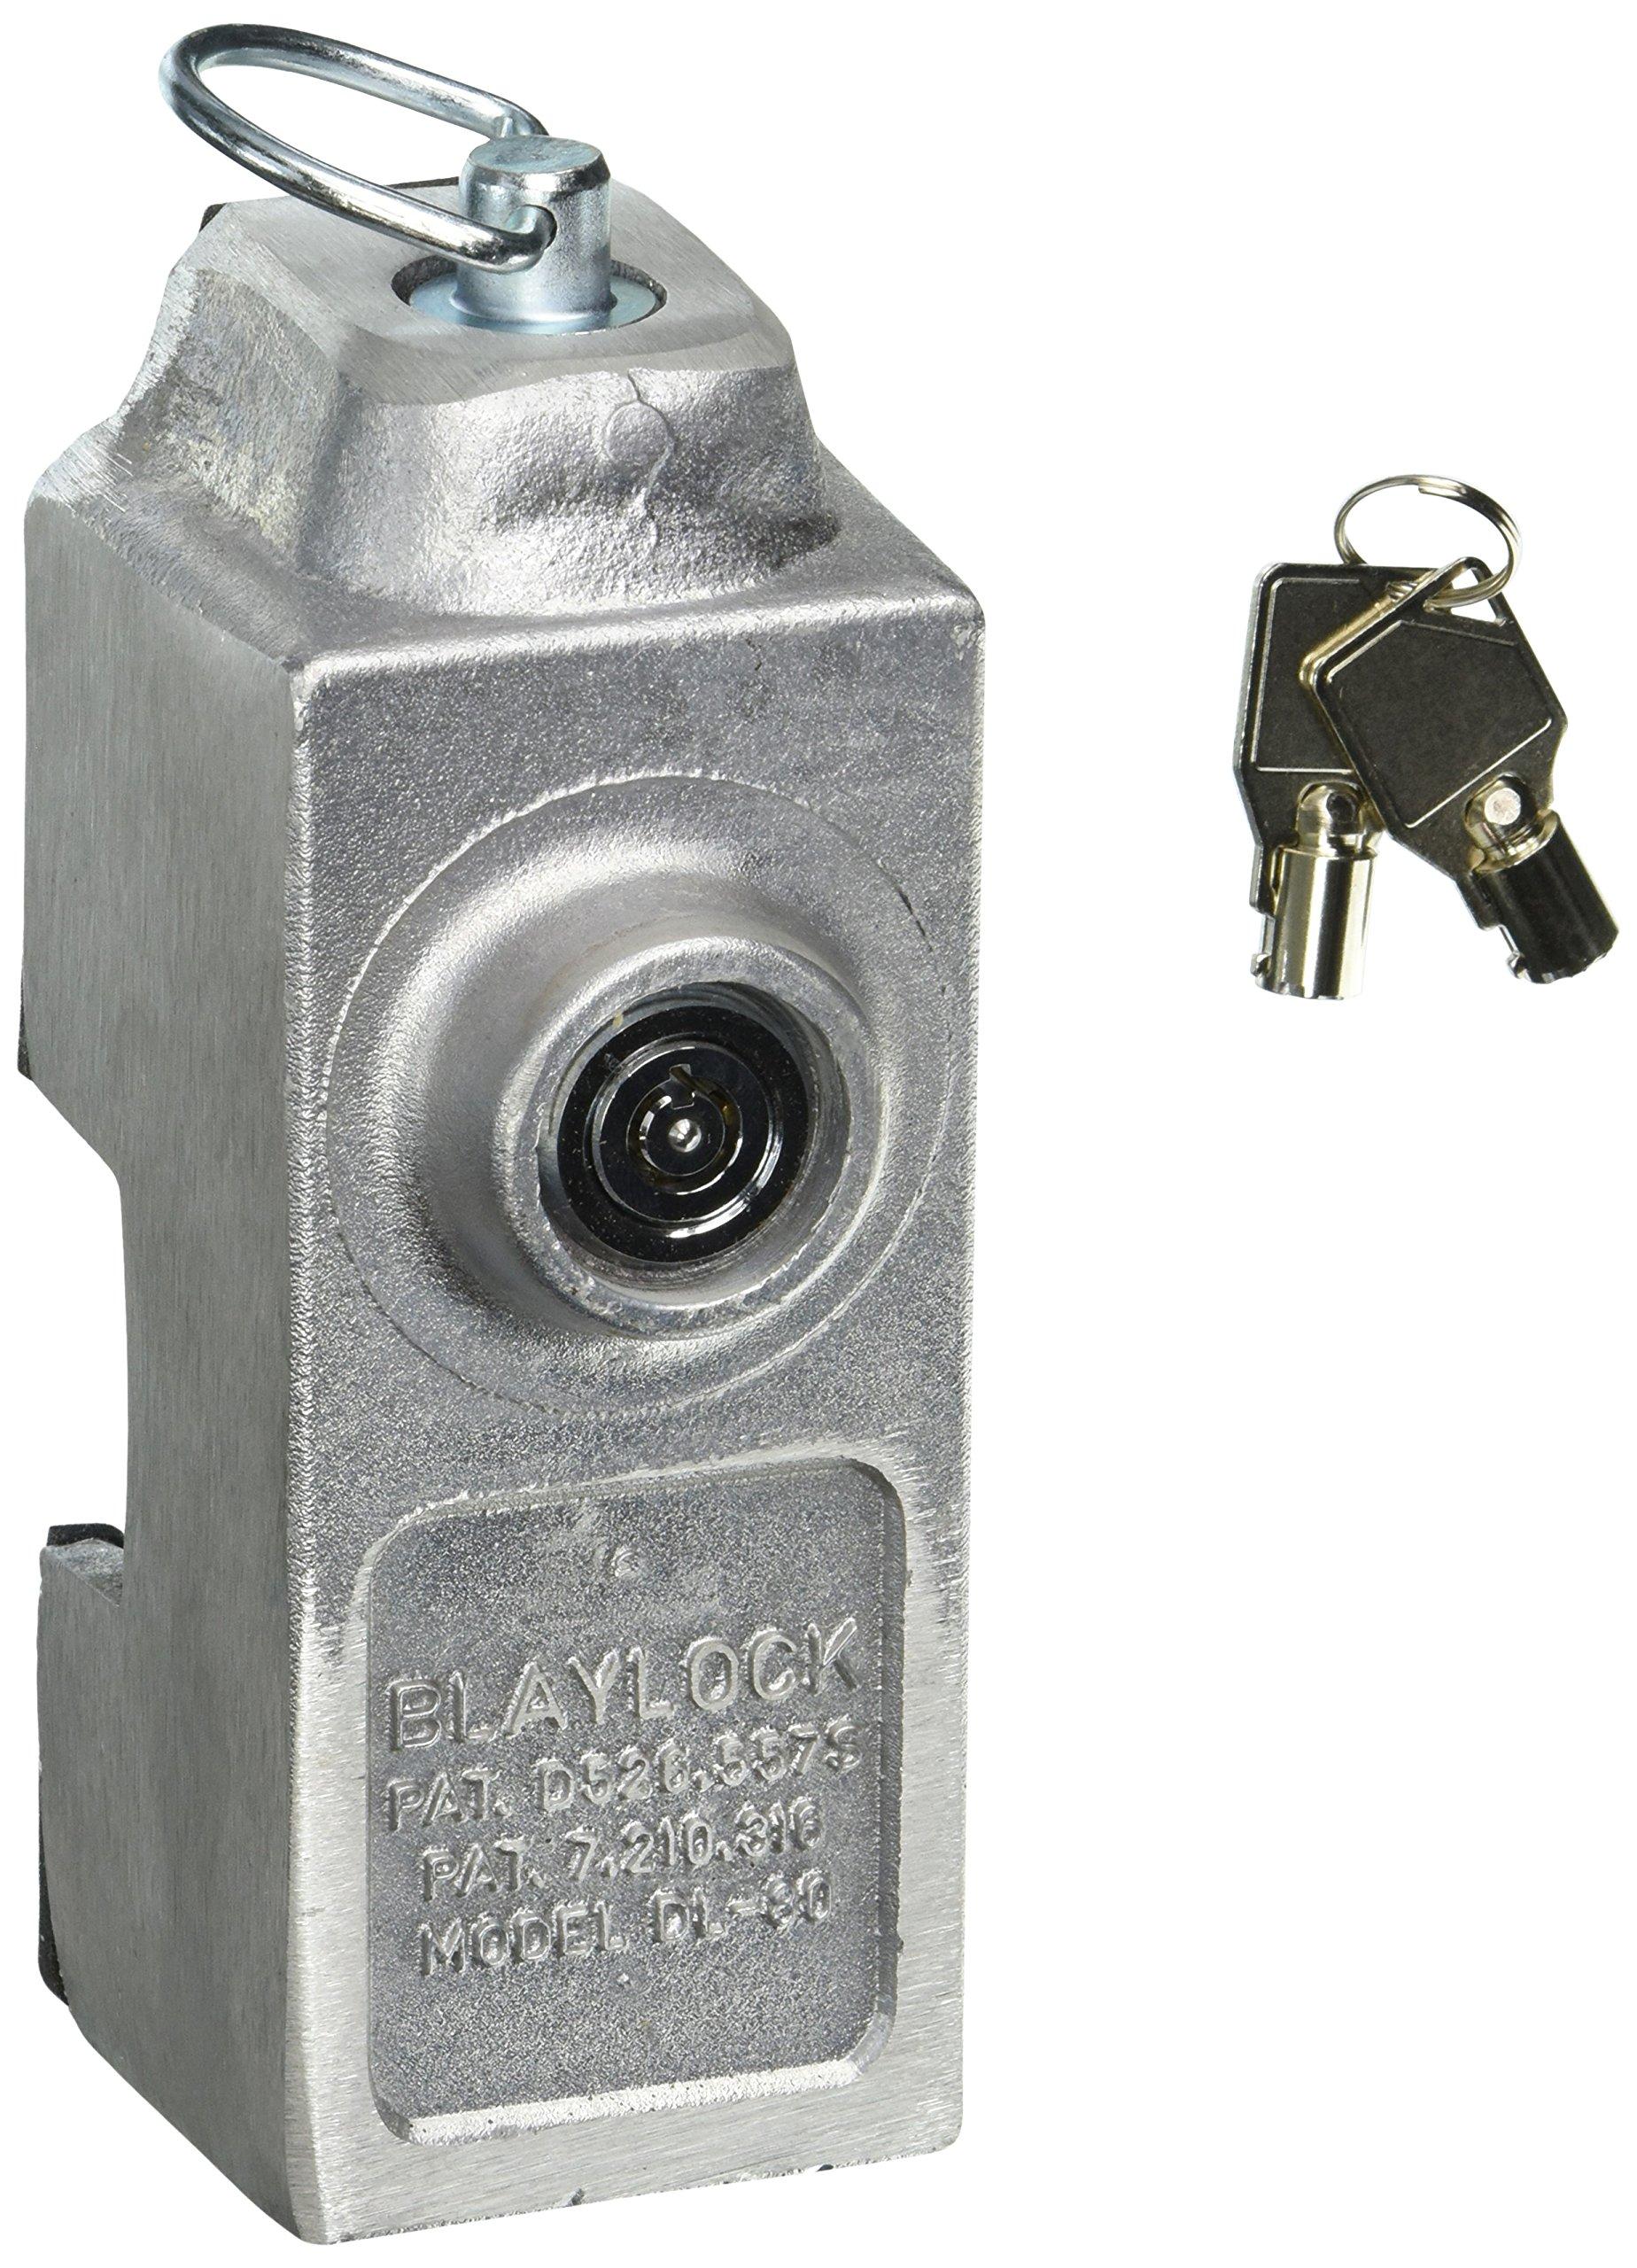 Blaylock American Metal 0229.3024 Metal DL-80 Coupler Lock by Blaylock American Metal